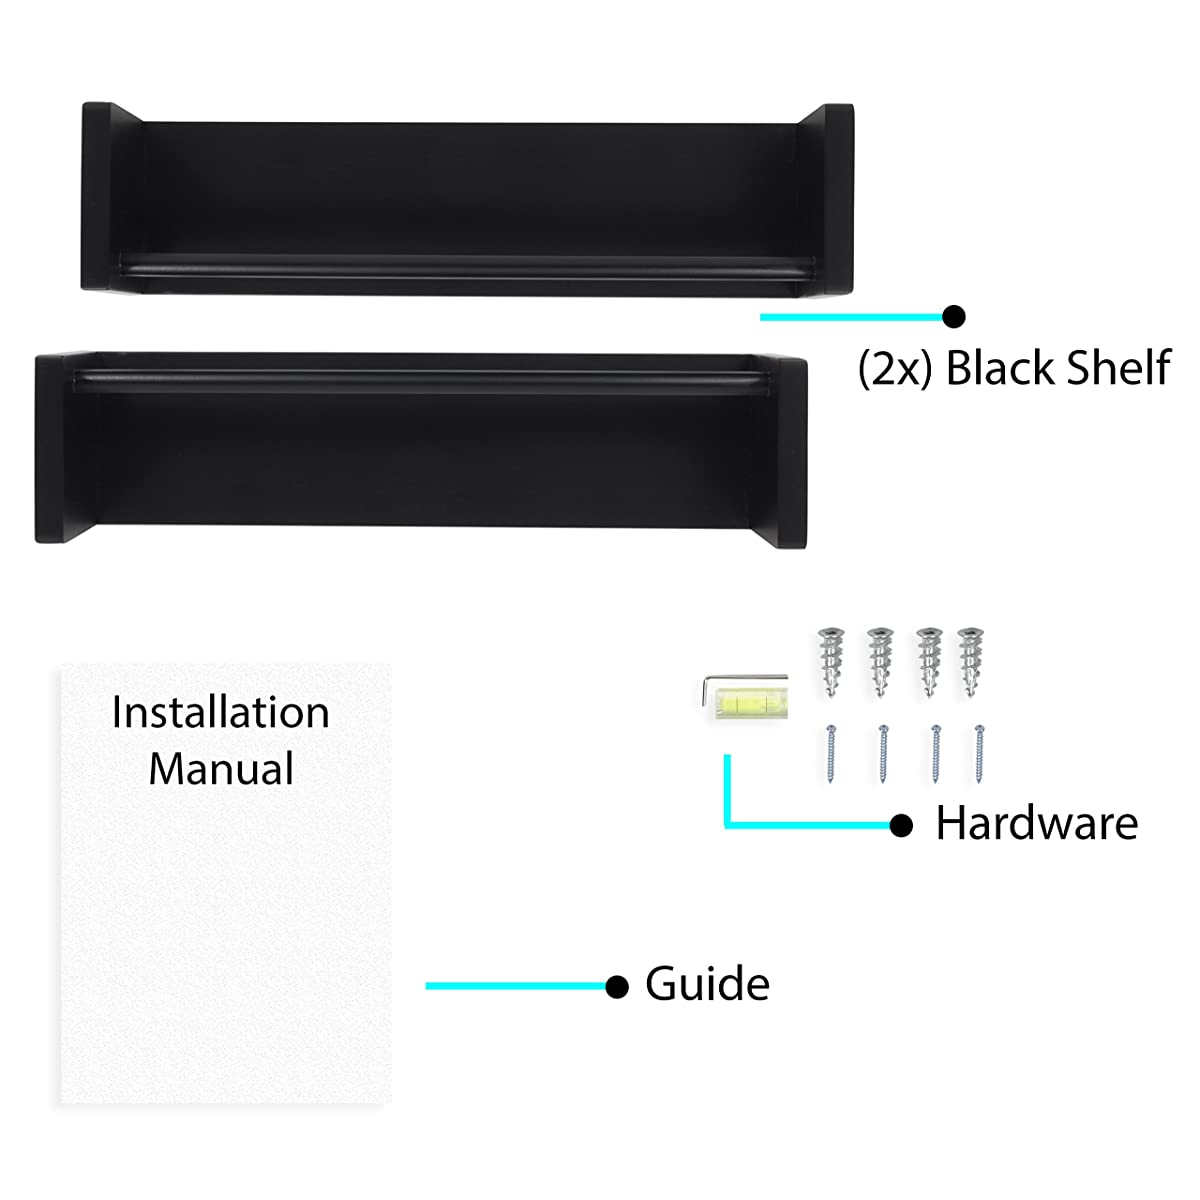 Wallniture Utah Set of 2 Multi-use Wood Kitchen Wall Shelf Black Spice Rack Also Good For Nursery Wall Shelf